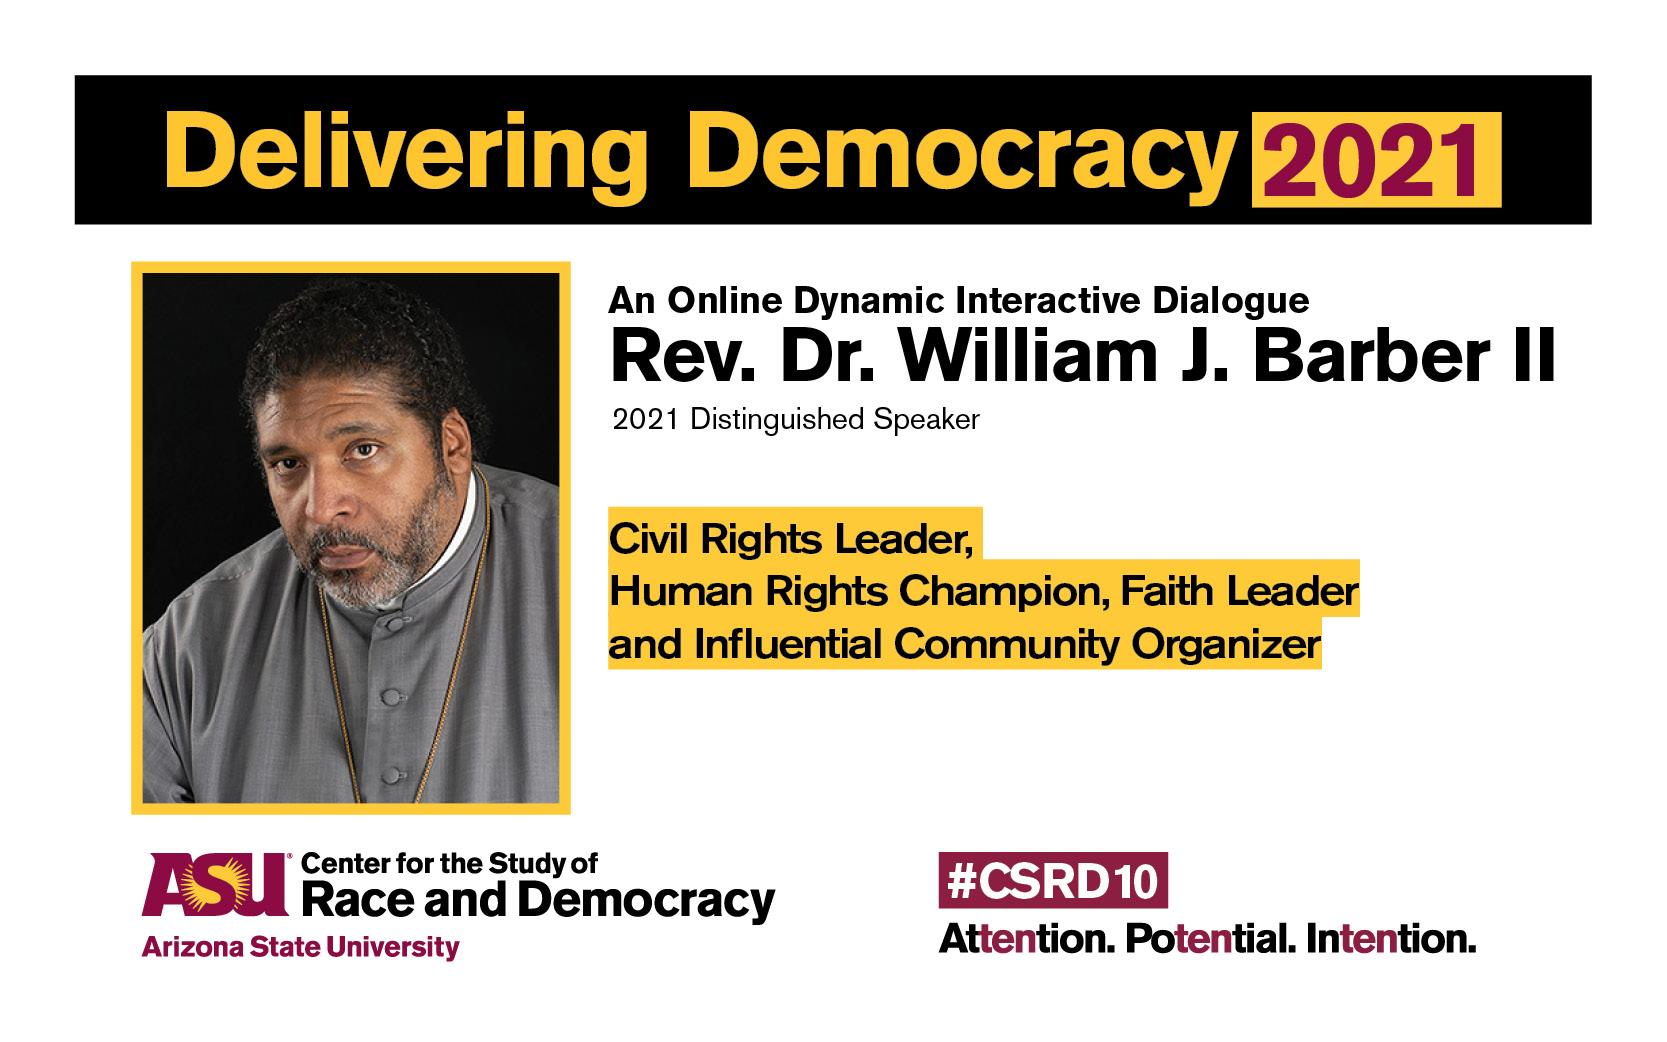 Delivering Democracy event image